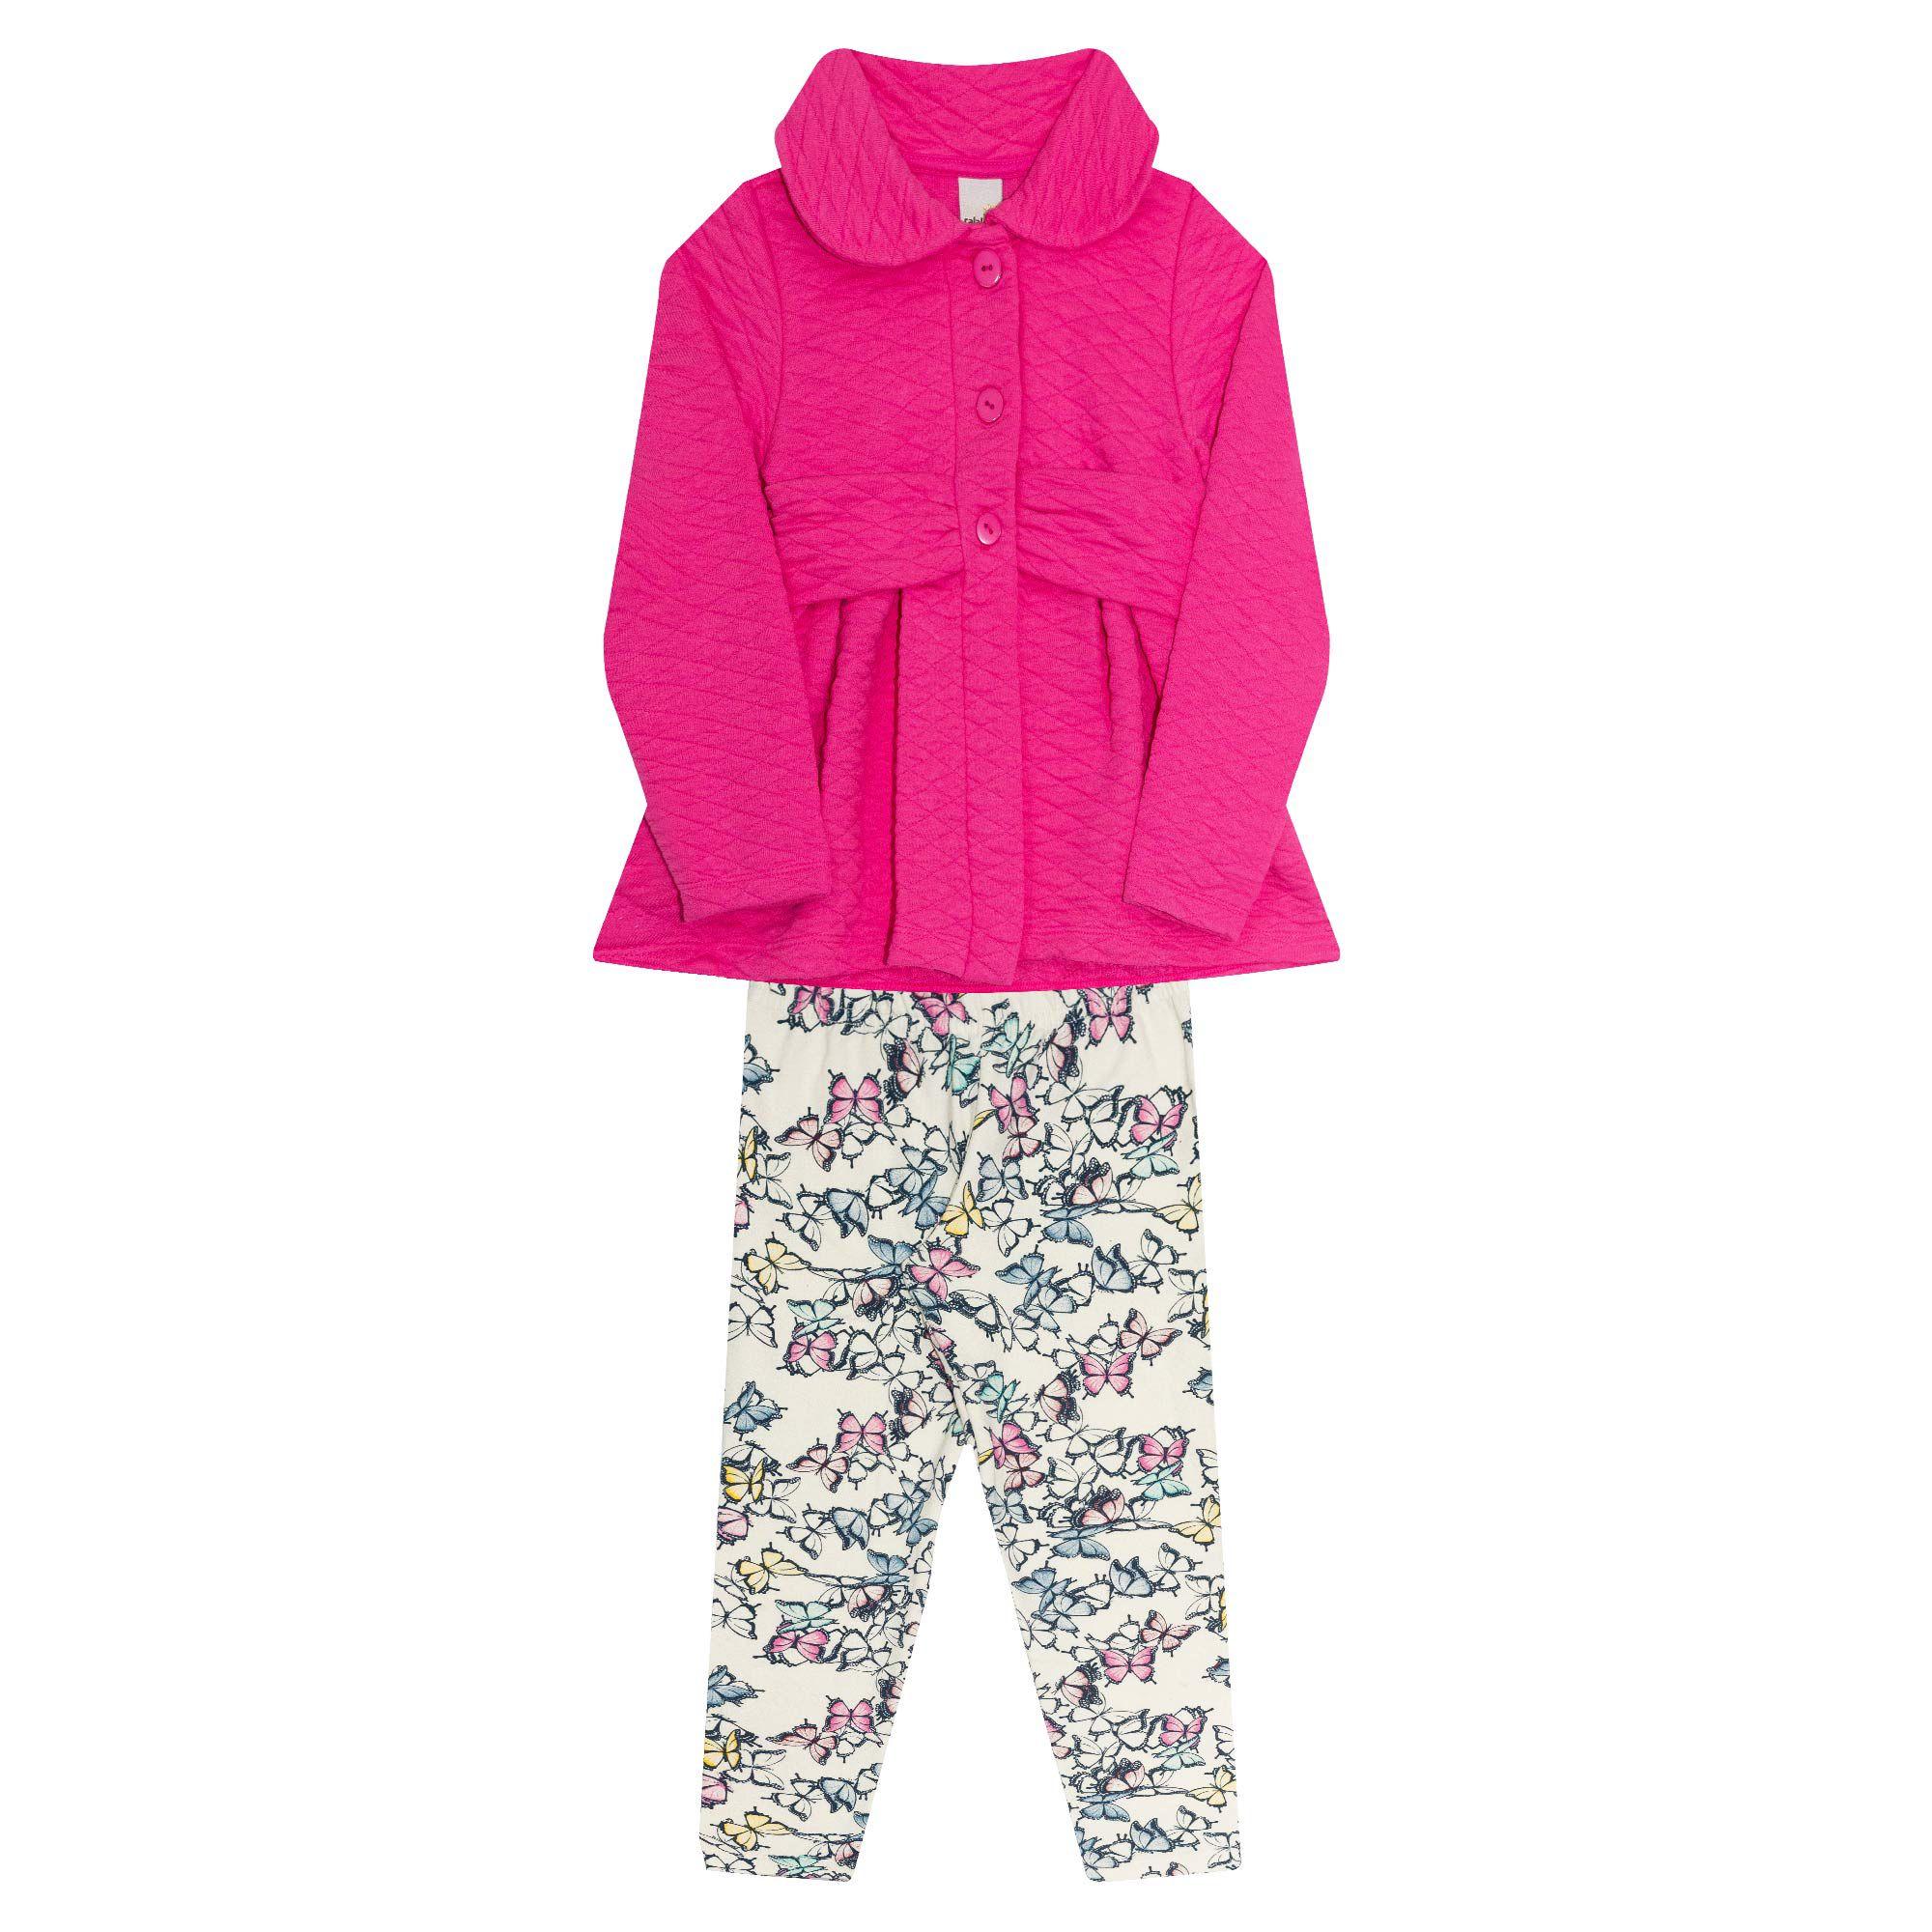 Conjunto Infantil Feminino  2 peças - Ref 30205 - Pink Alécia - Ralakids